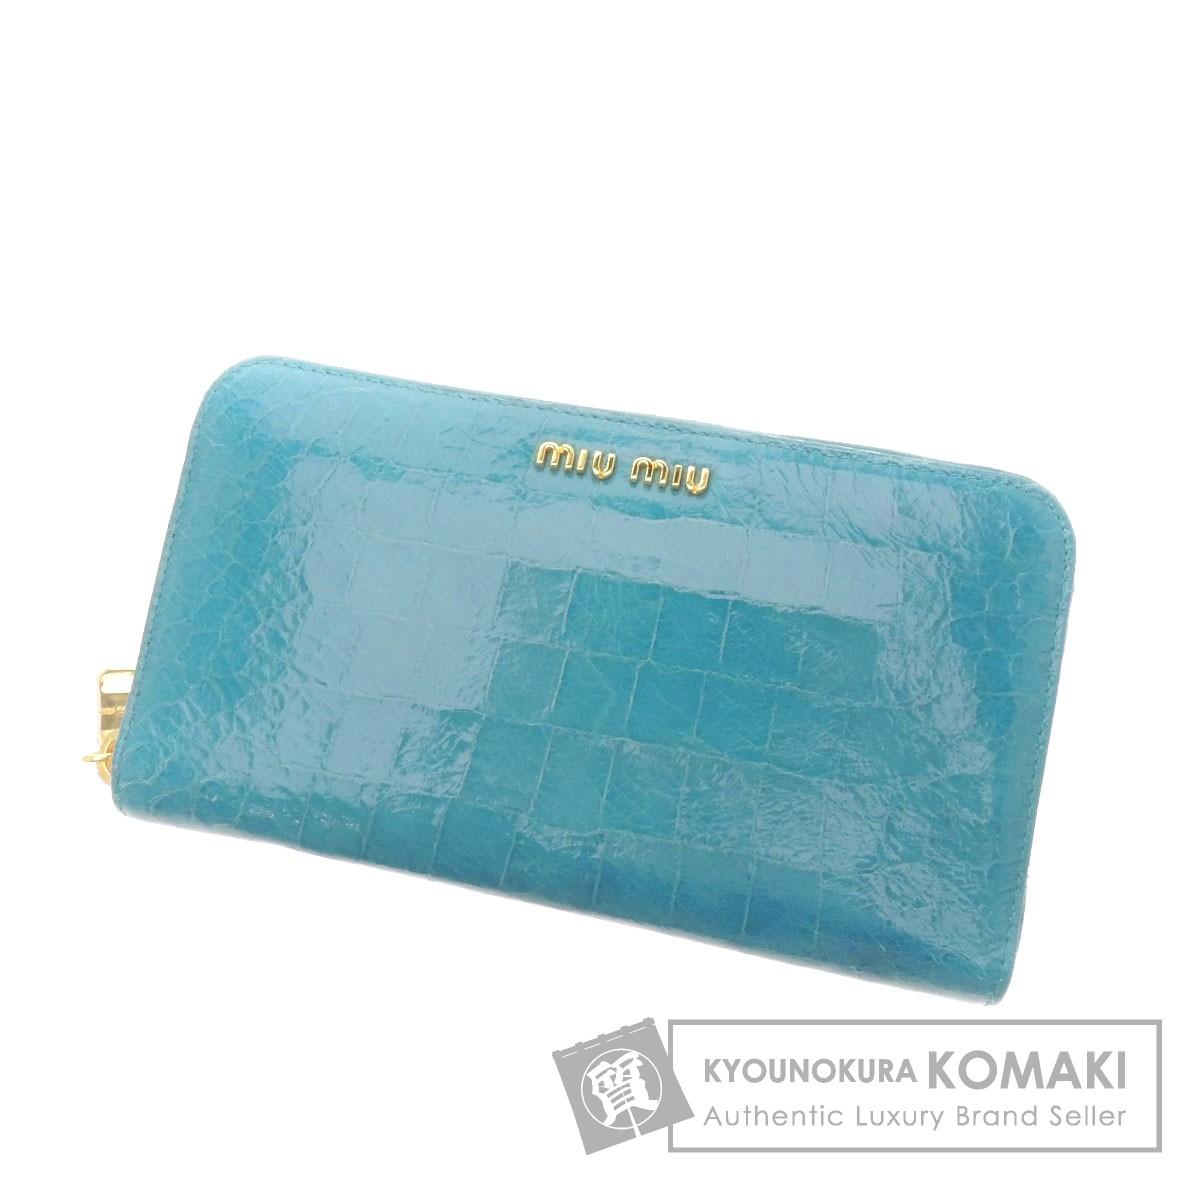 MIUMIU ロゴモチーフ 長財布(小銭入れあり) レザー レディース 【中古】【ミュウミュウ】